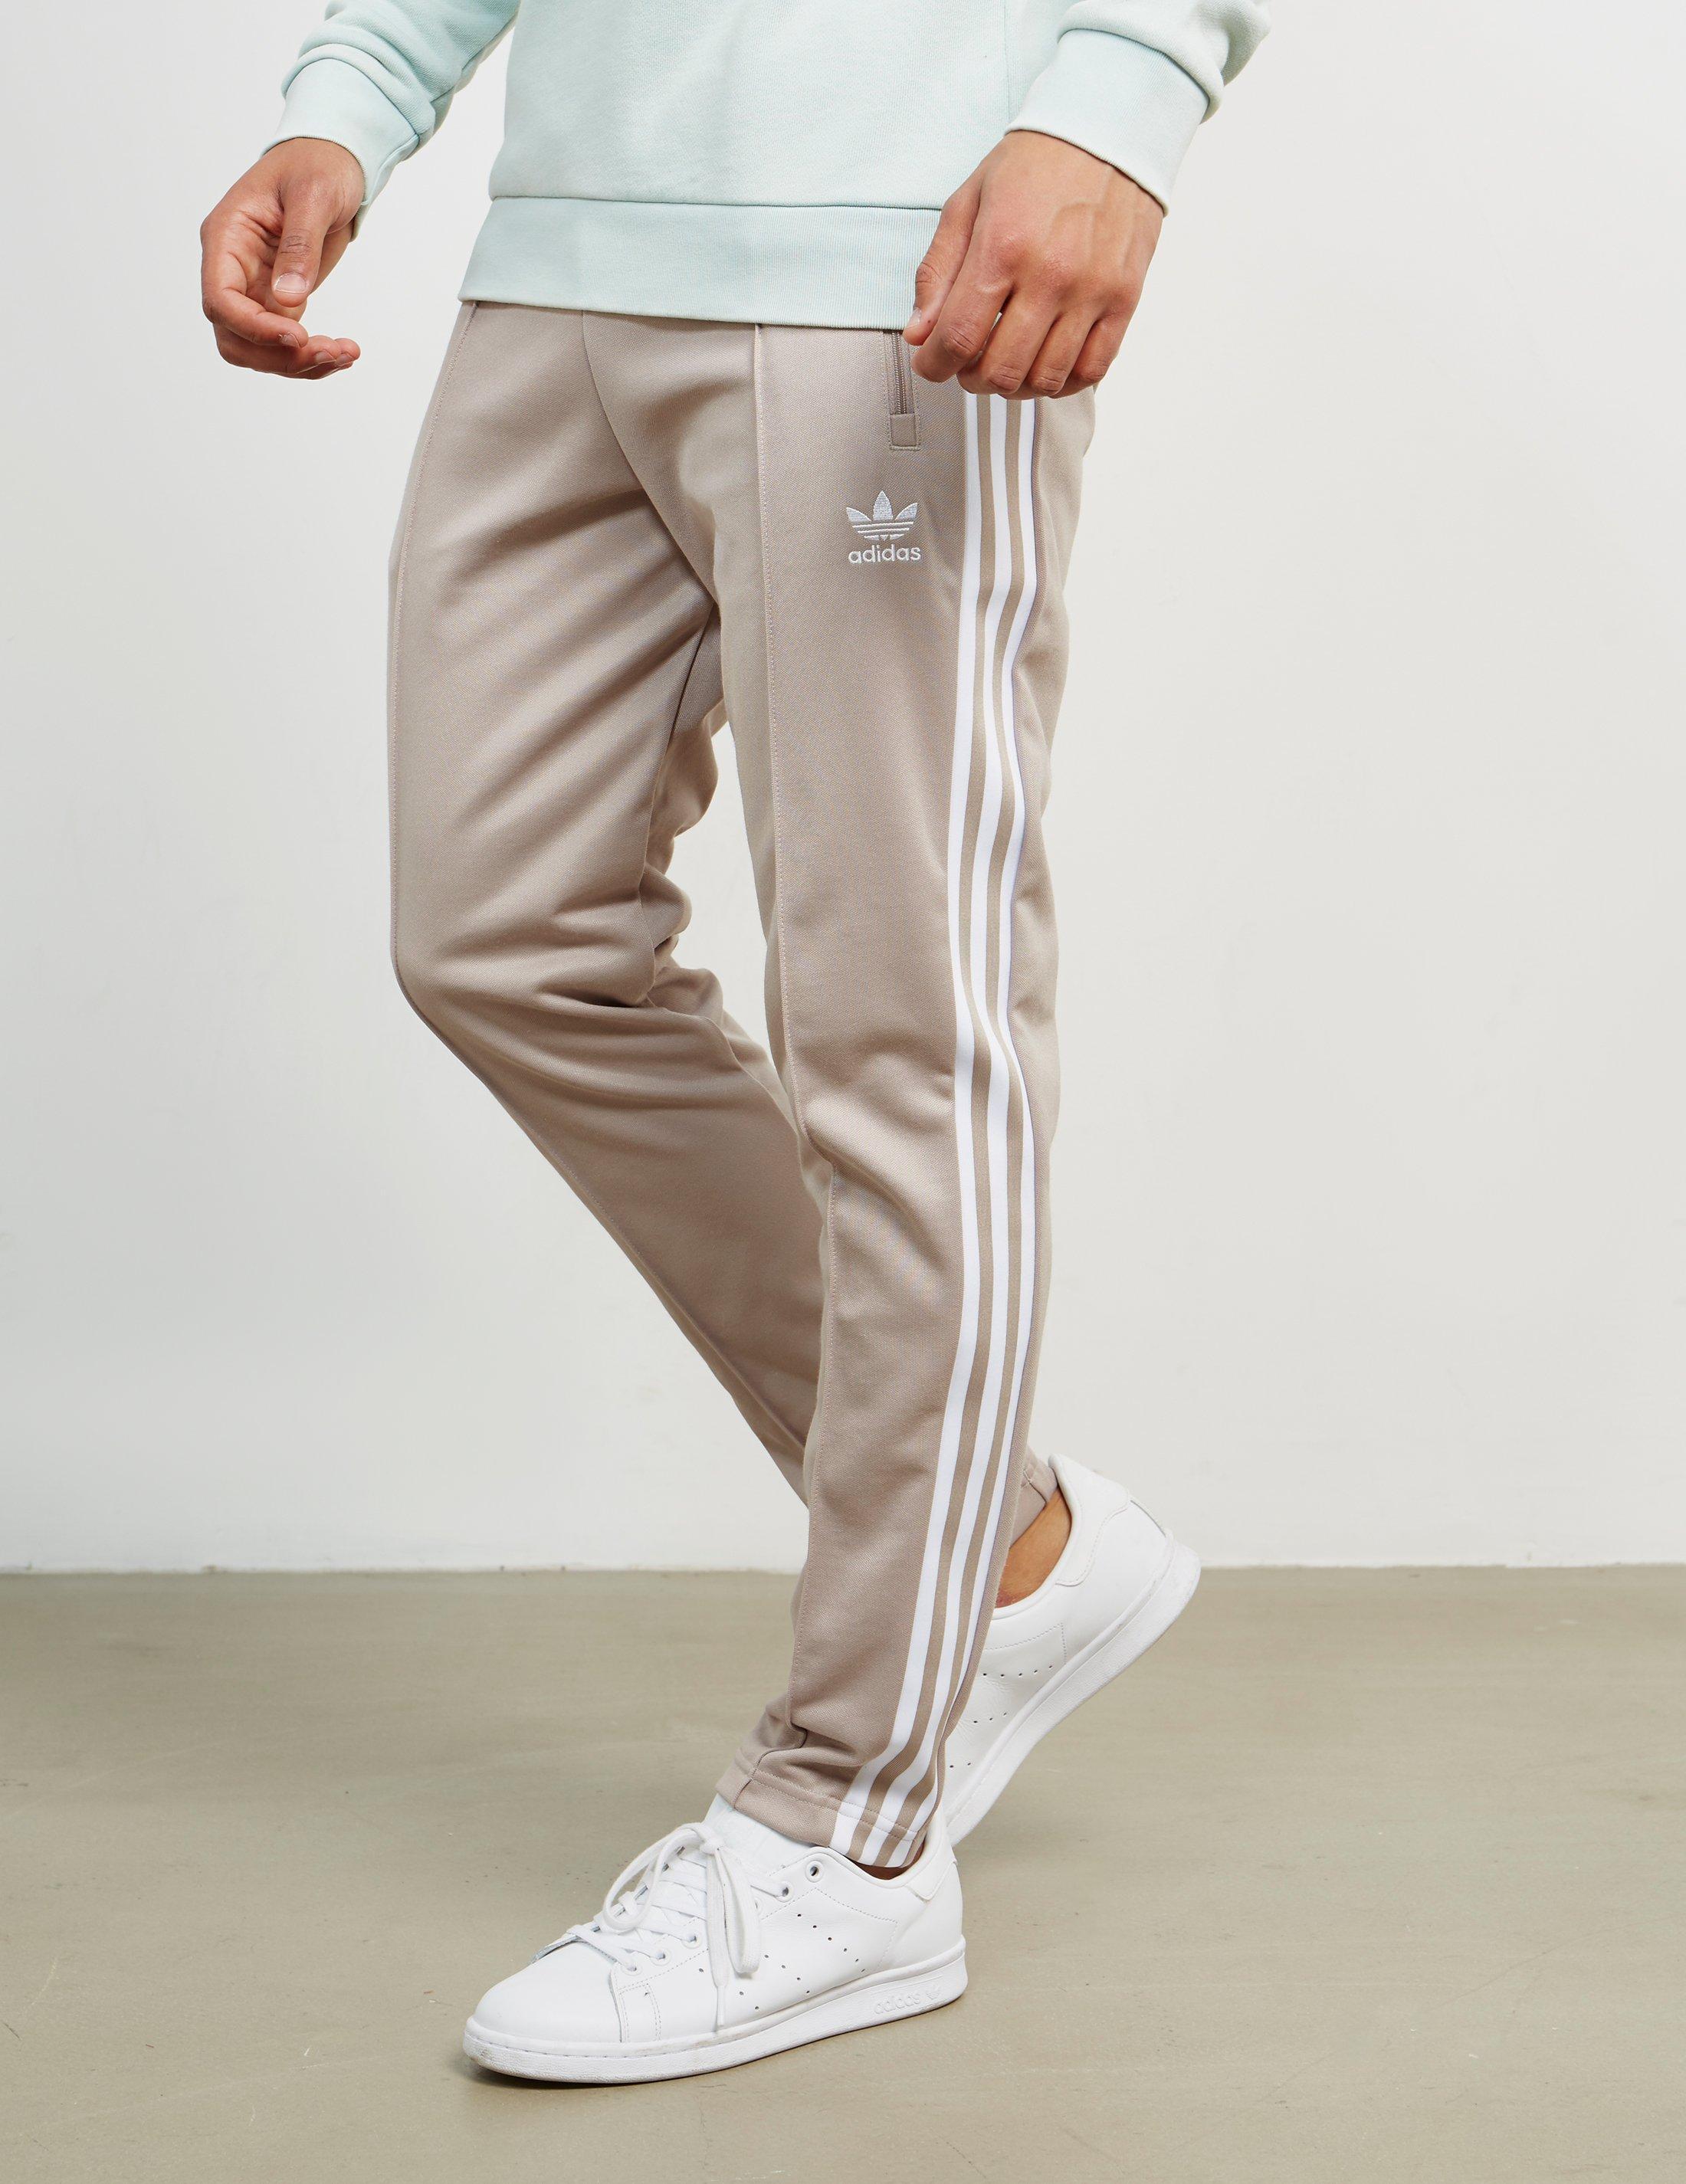 f06329f119b adidas Originals Mens Beckenbauer Cuffed Track Pants Grey in Gray ...